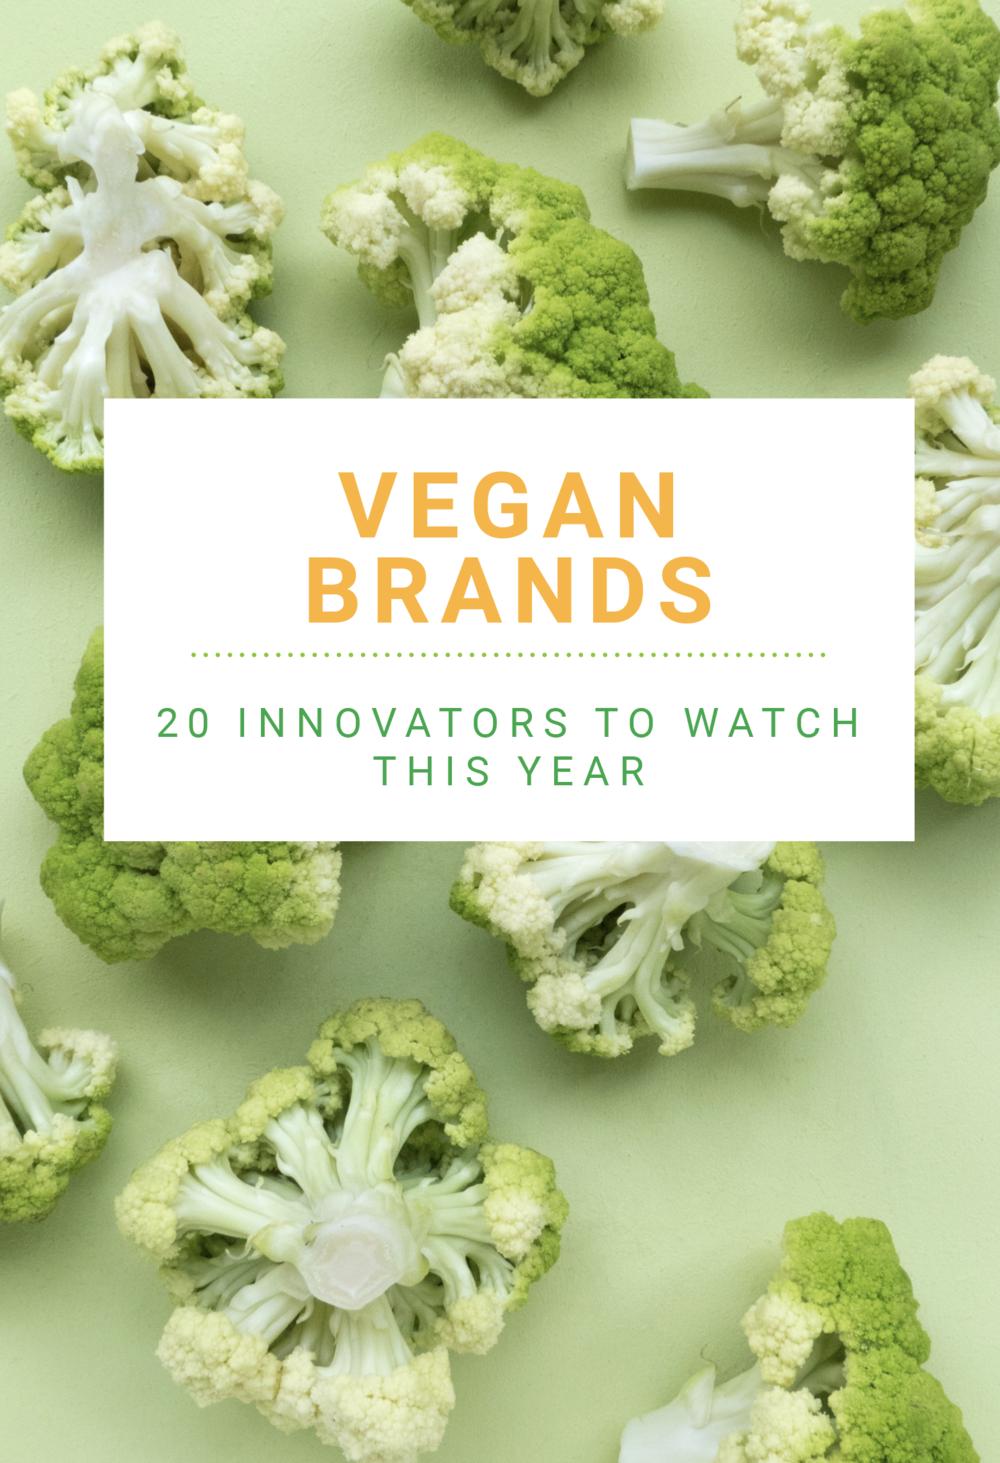 vegan brands cover large.png